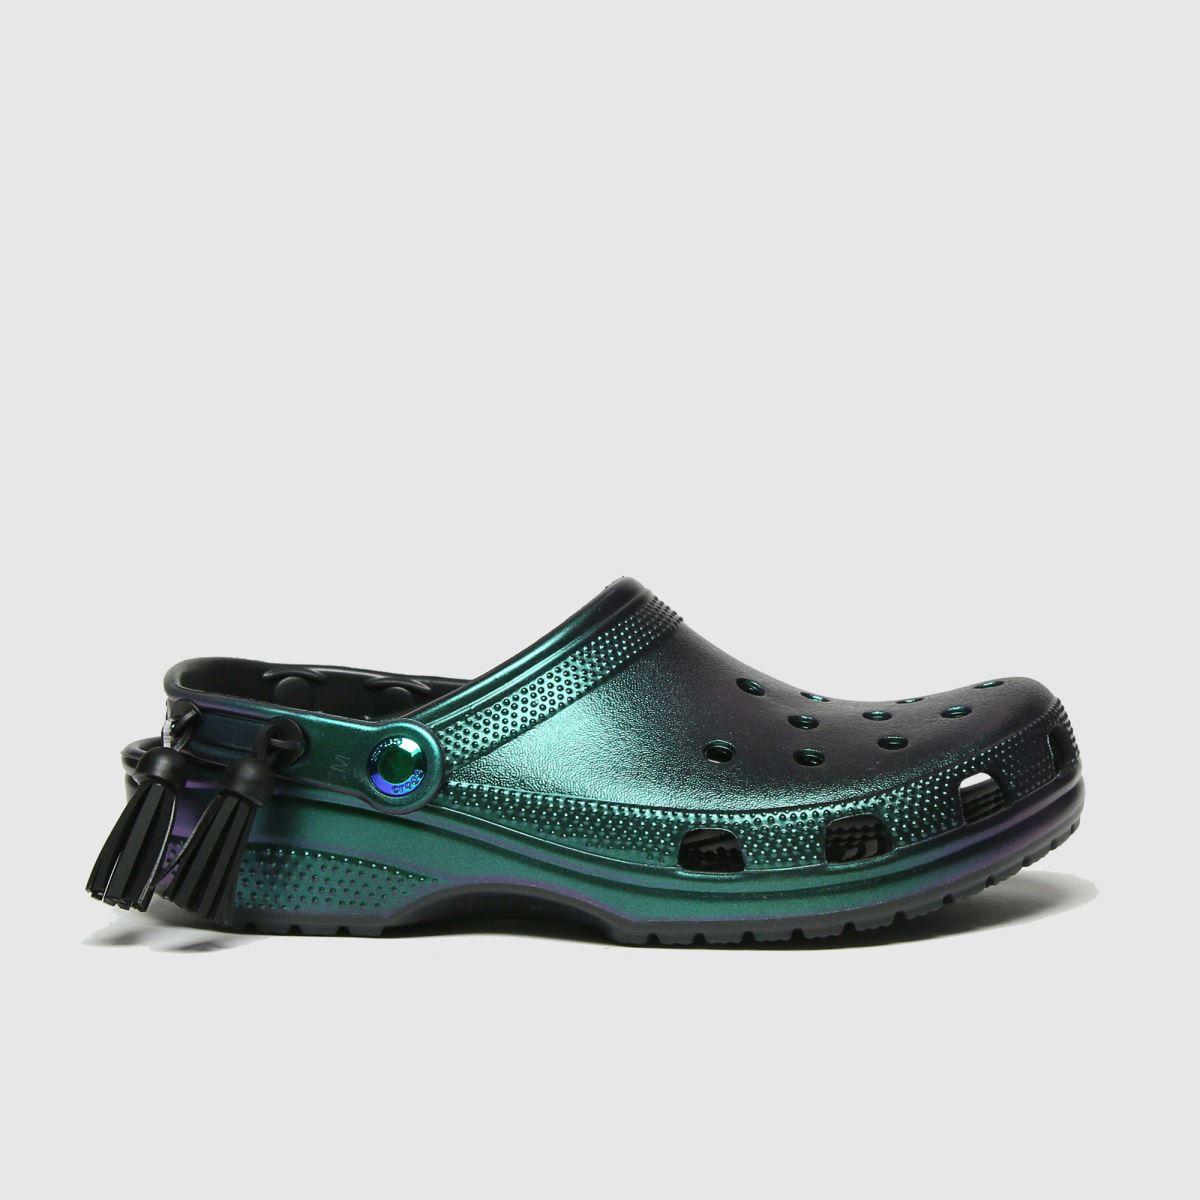 Crocs Purple Festival Classic Clog Sandals